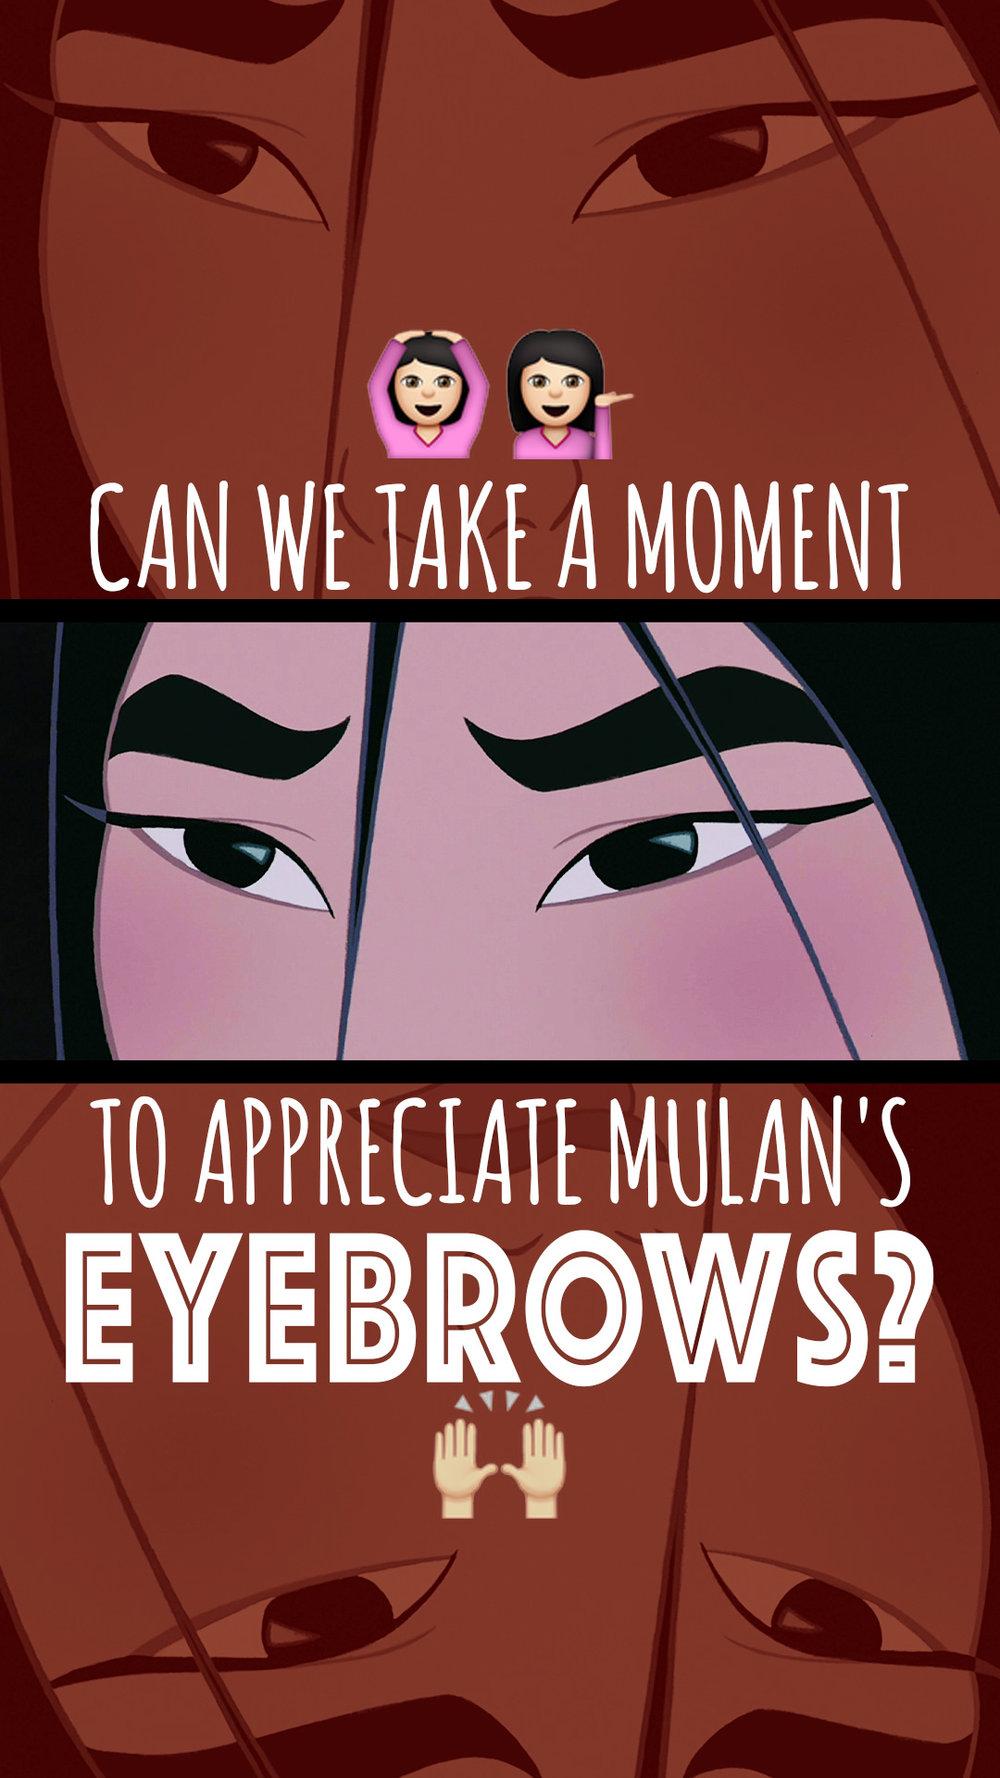 mca_di_image_mulan_style_eyebrows.jpg